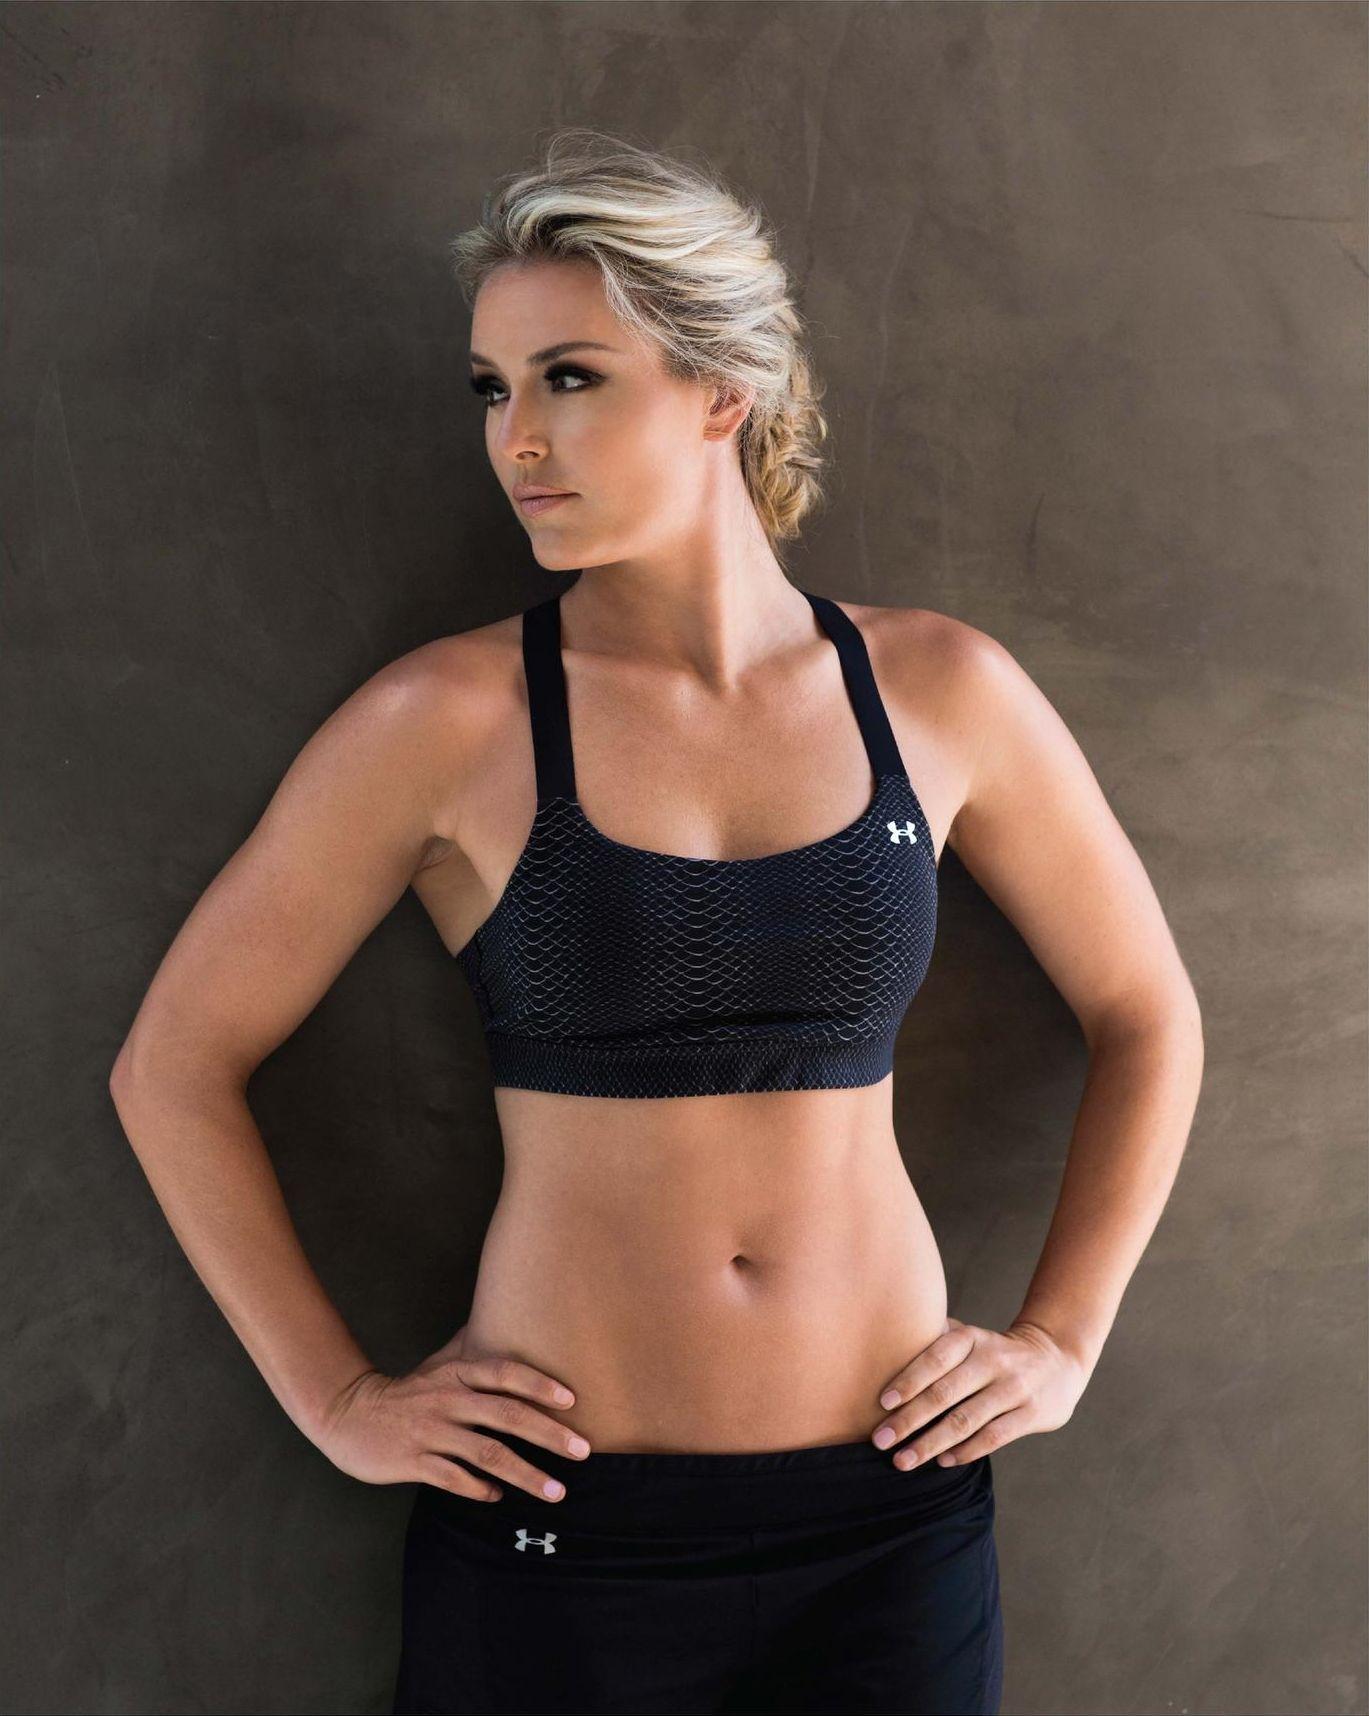 [UNCENSORED] Skier Lindsey Vonn Topless • Page 3